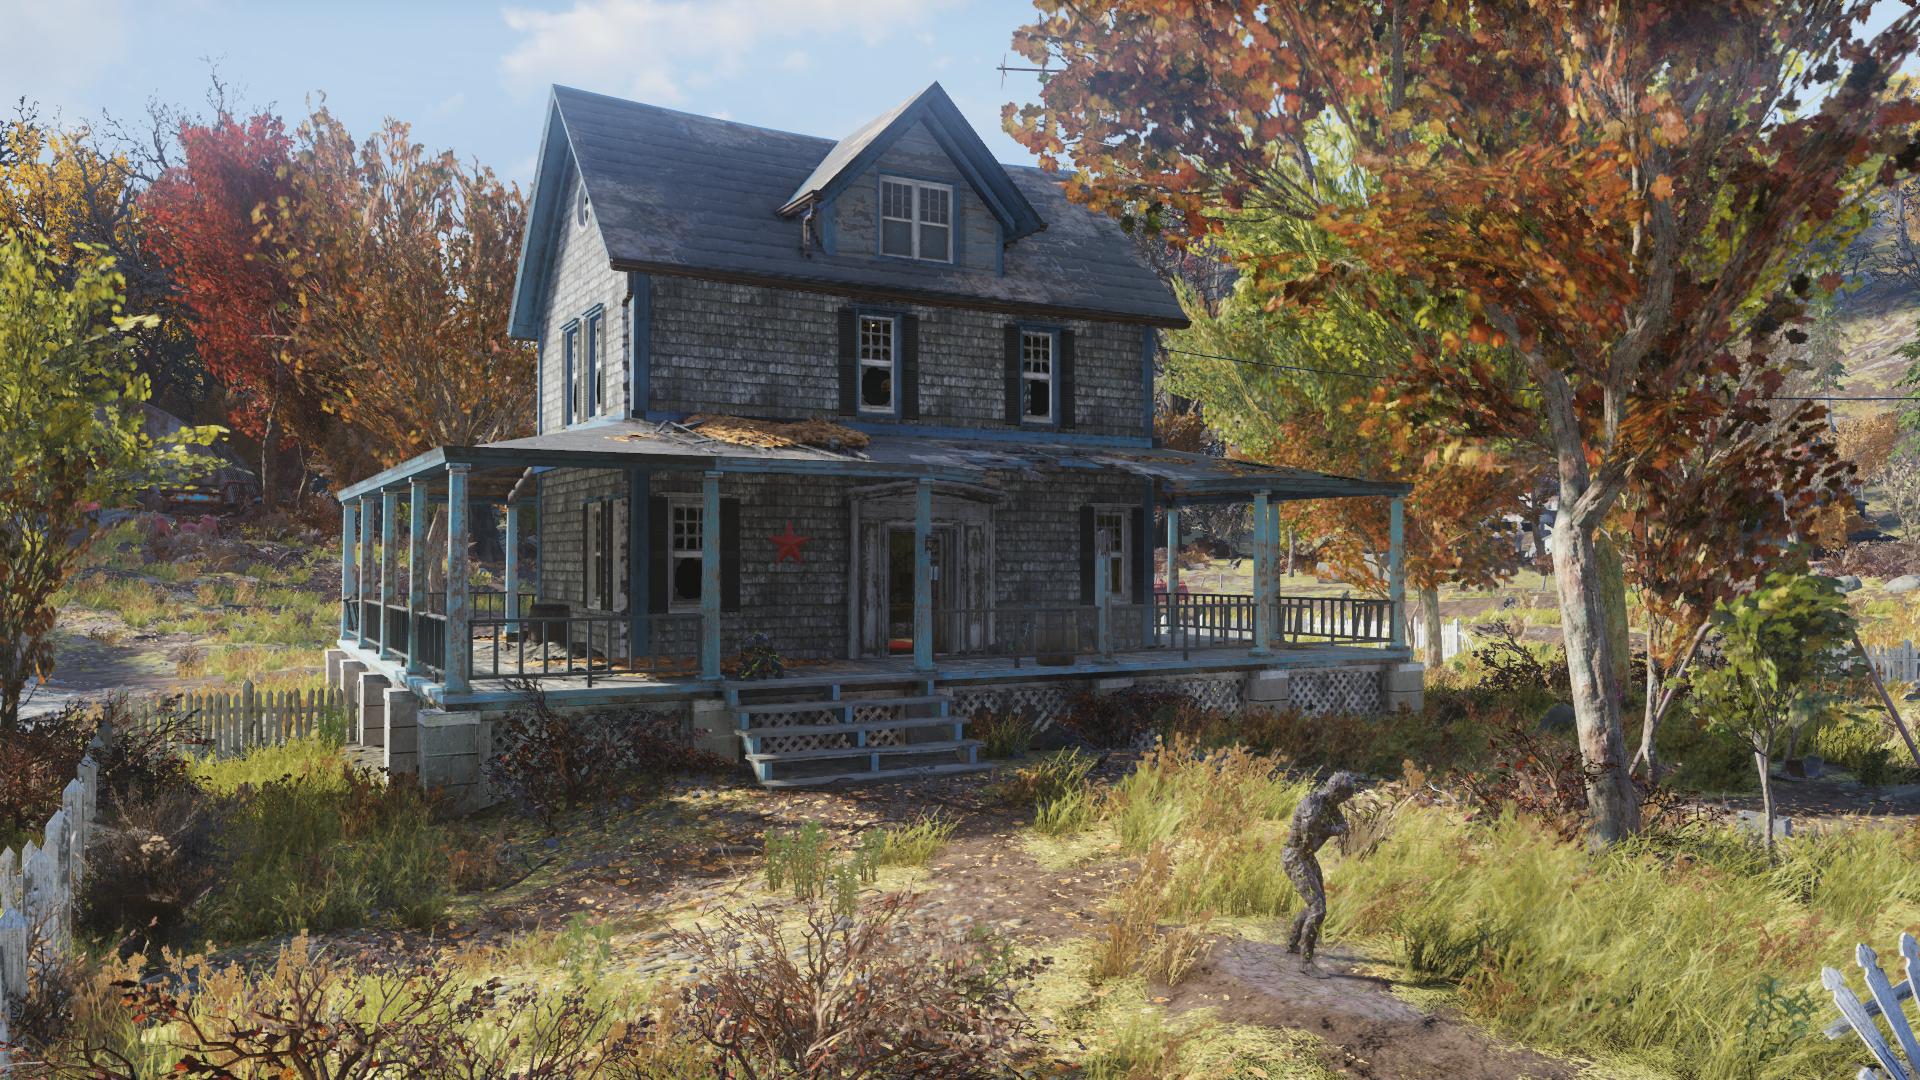 Wixon homestead